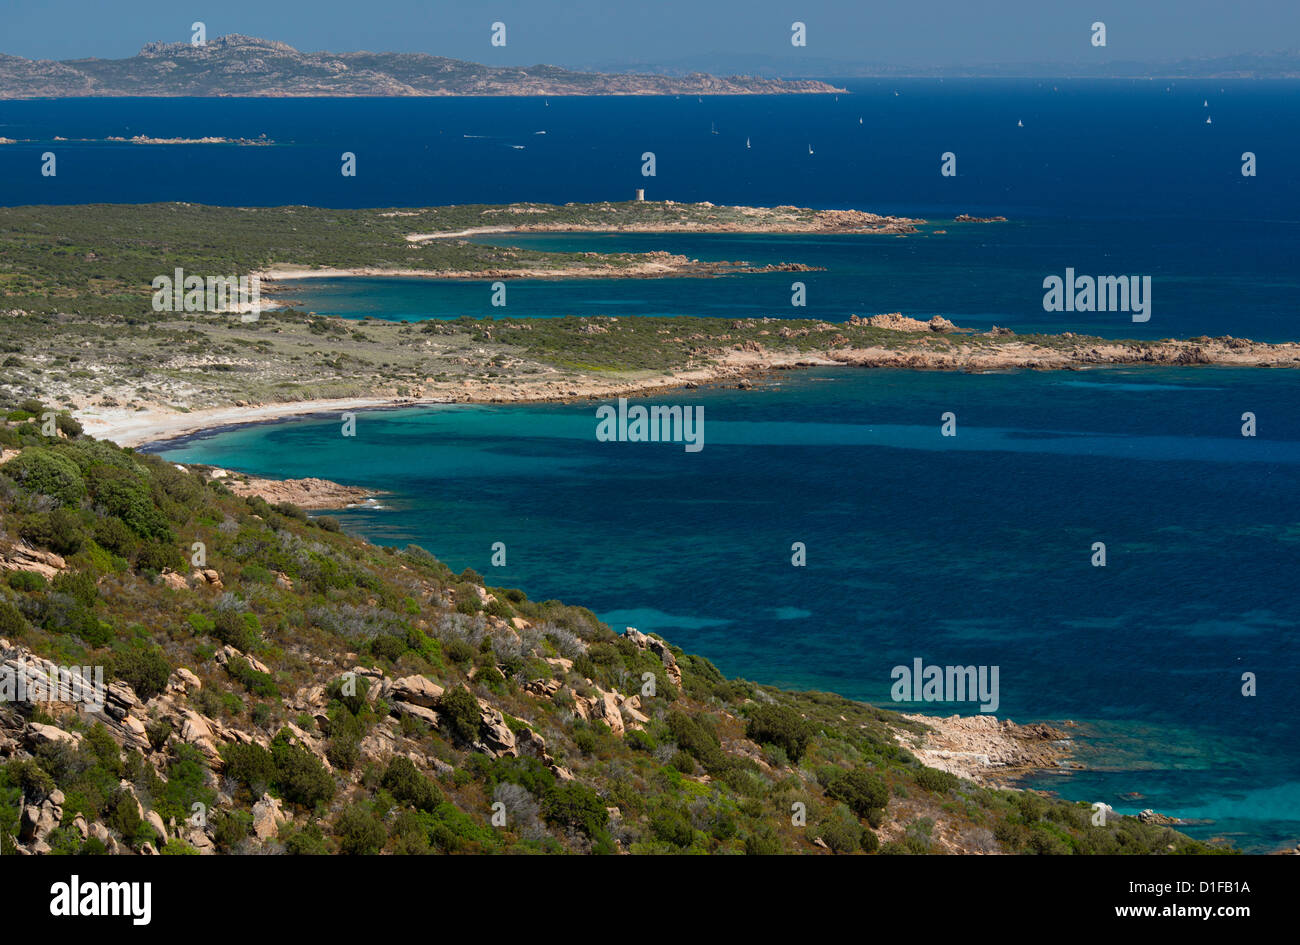 View of the coast of Corsica near Bonifacio called Reserve Naturelle des Bouches de Bonifacio, Corsica, France, - Stock Image